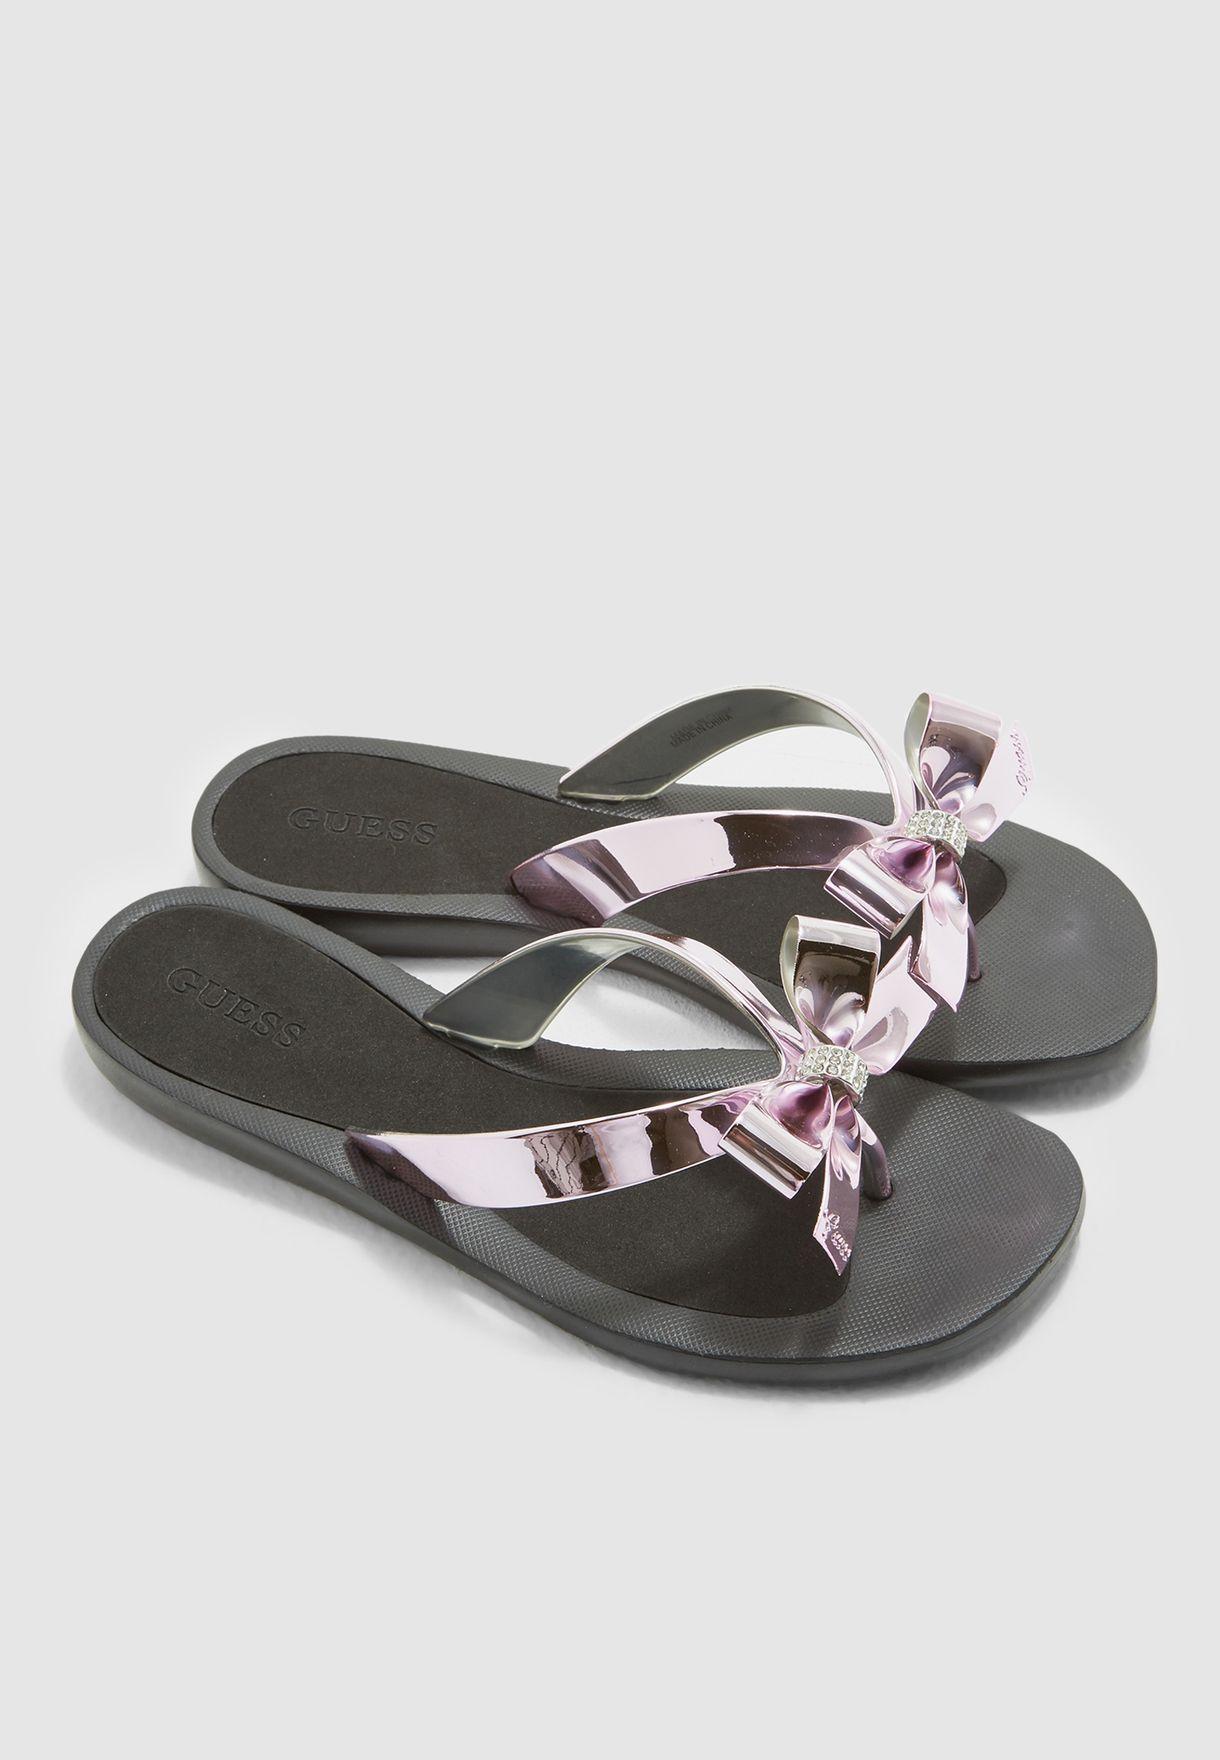 79021b70f3c Shop Guess black Bow Thong Sandals gwTUTU9 for Women in UAE ...